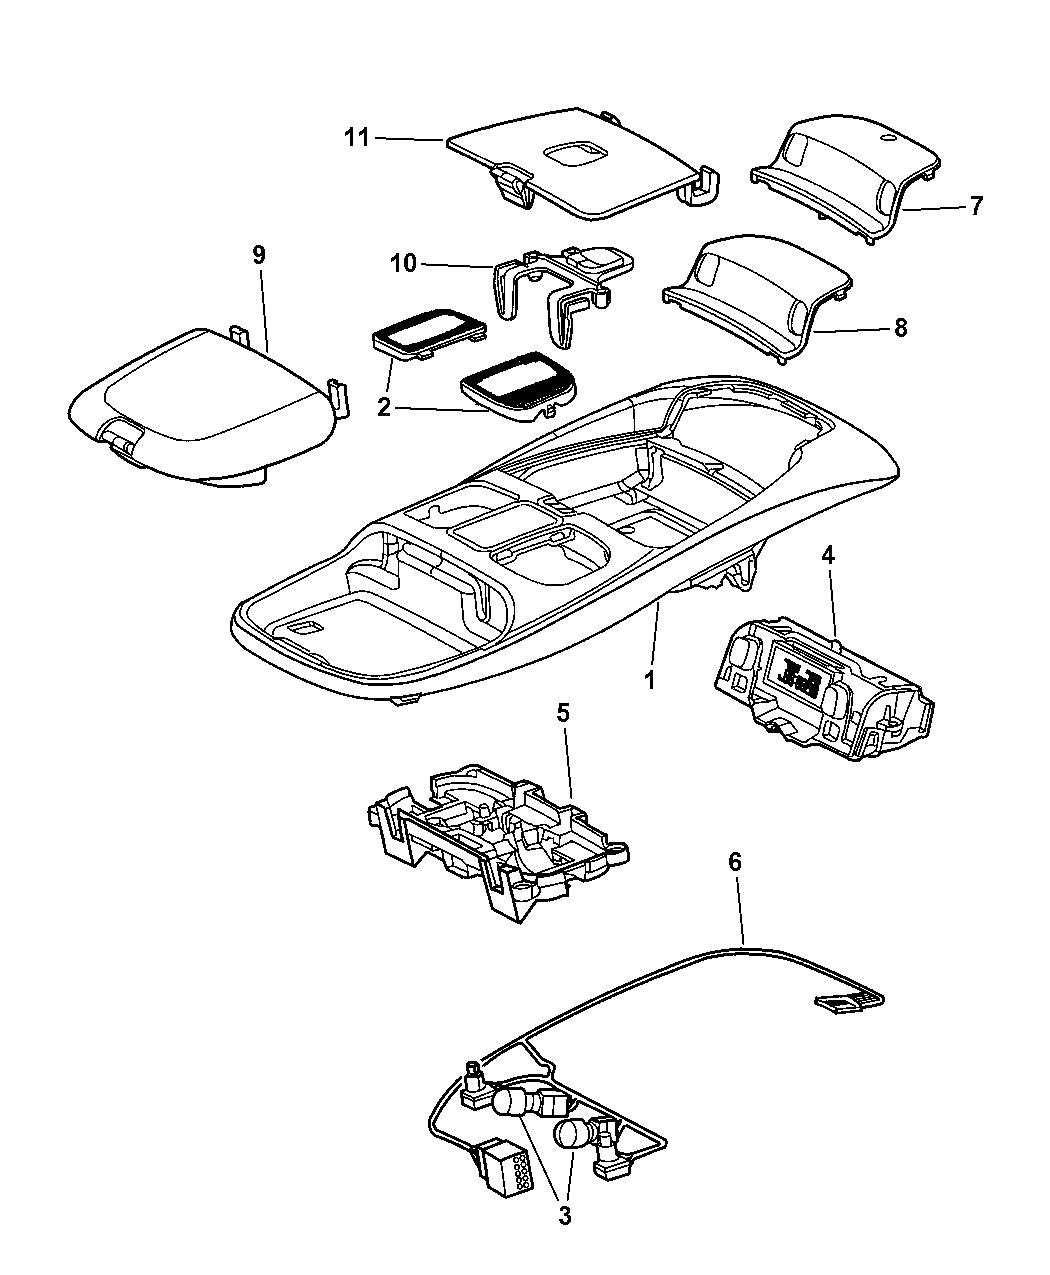 2002 Dodge Ram 2500 Quad & Club Cab Overhead Console